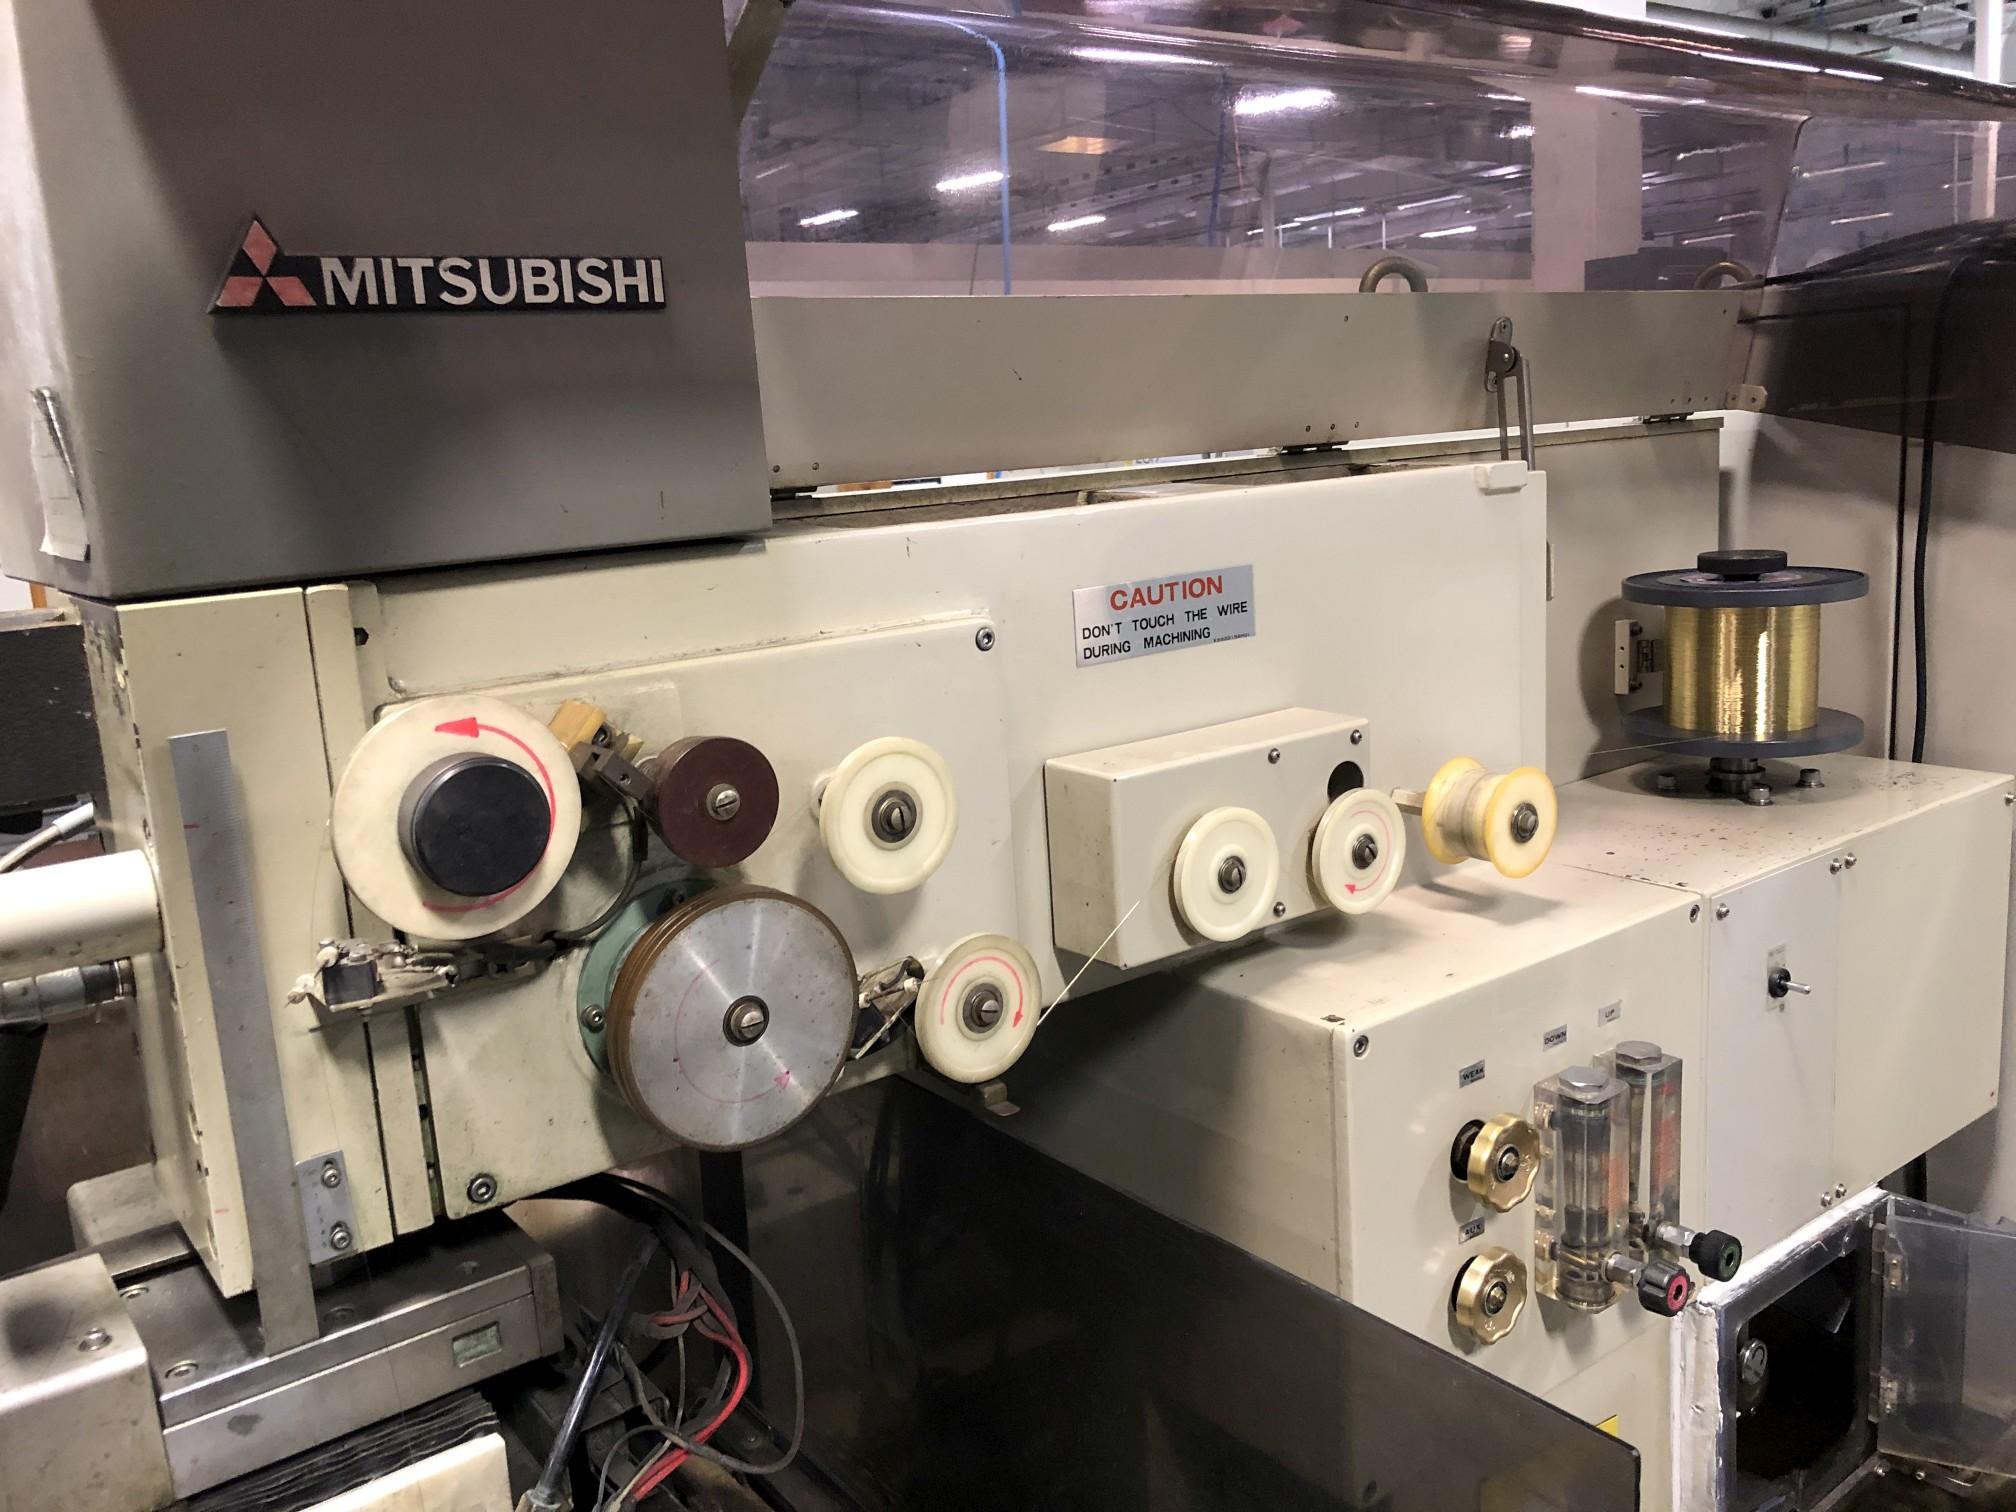 1988 Mitsubishi DWC90H CNC Wire EDM - Image 4 of 13